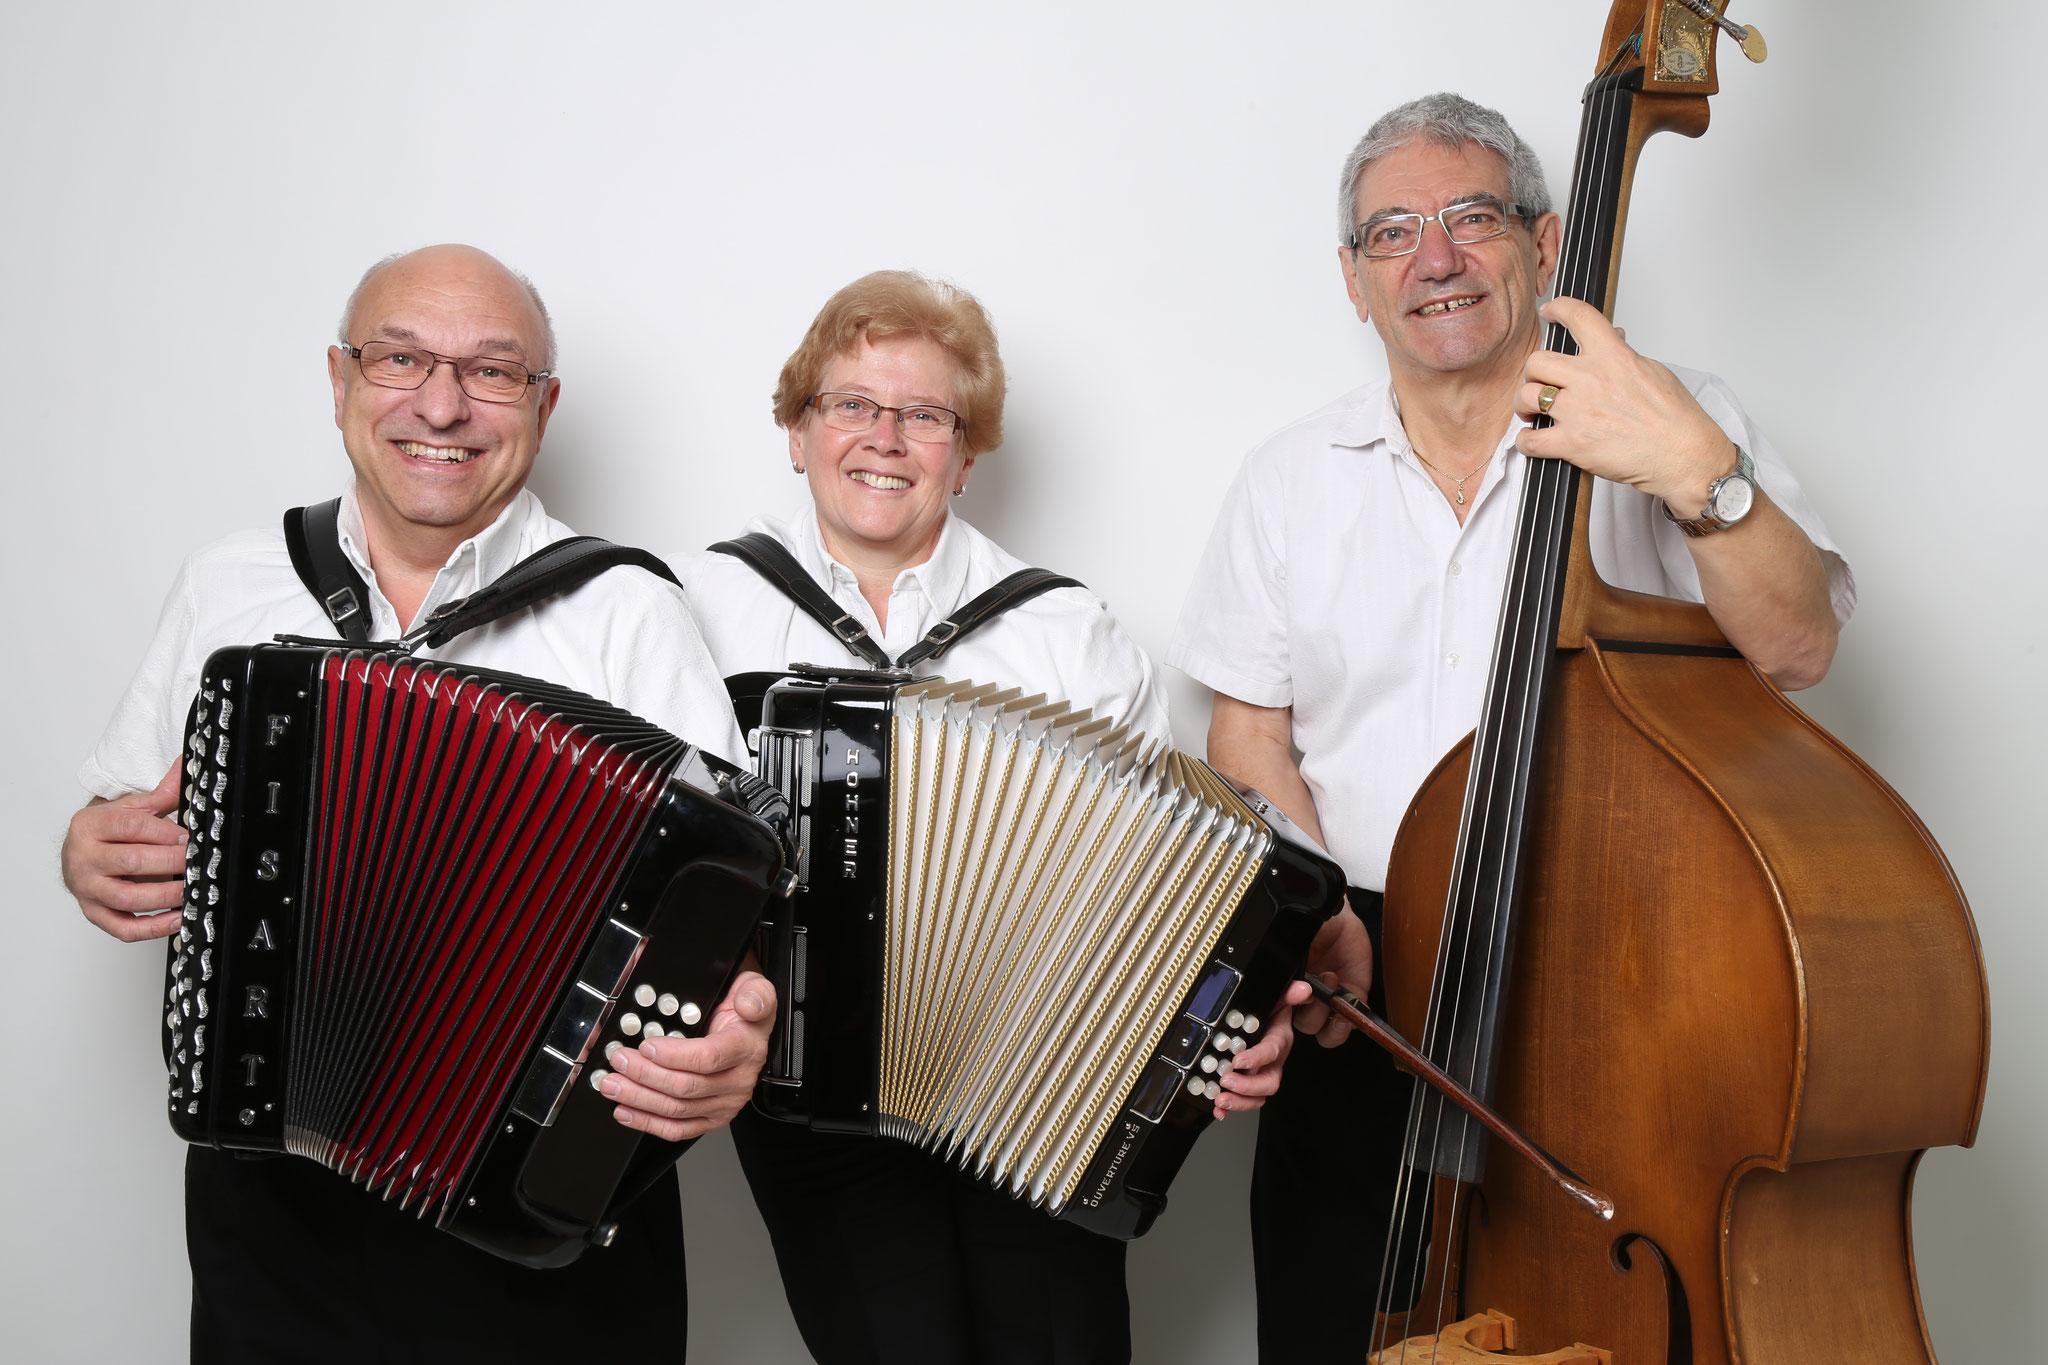 2016 mit Diat. Harmonika (Hohner und Fisart) Adi Schmidiger Bass